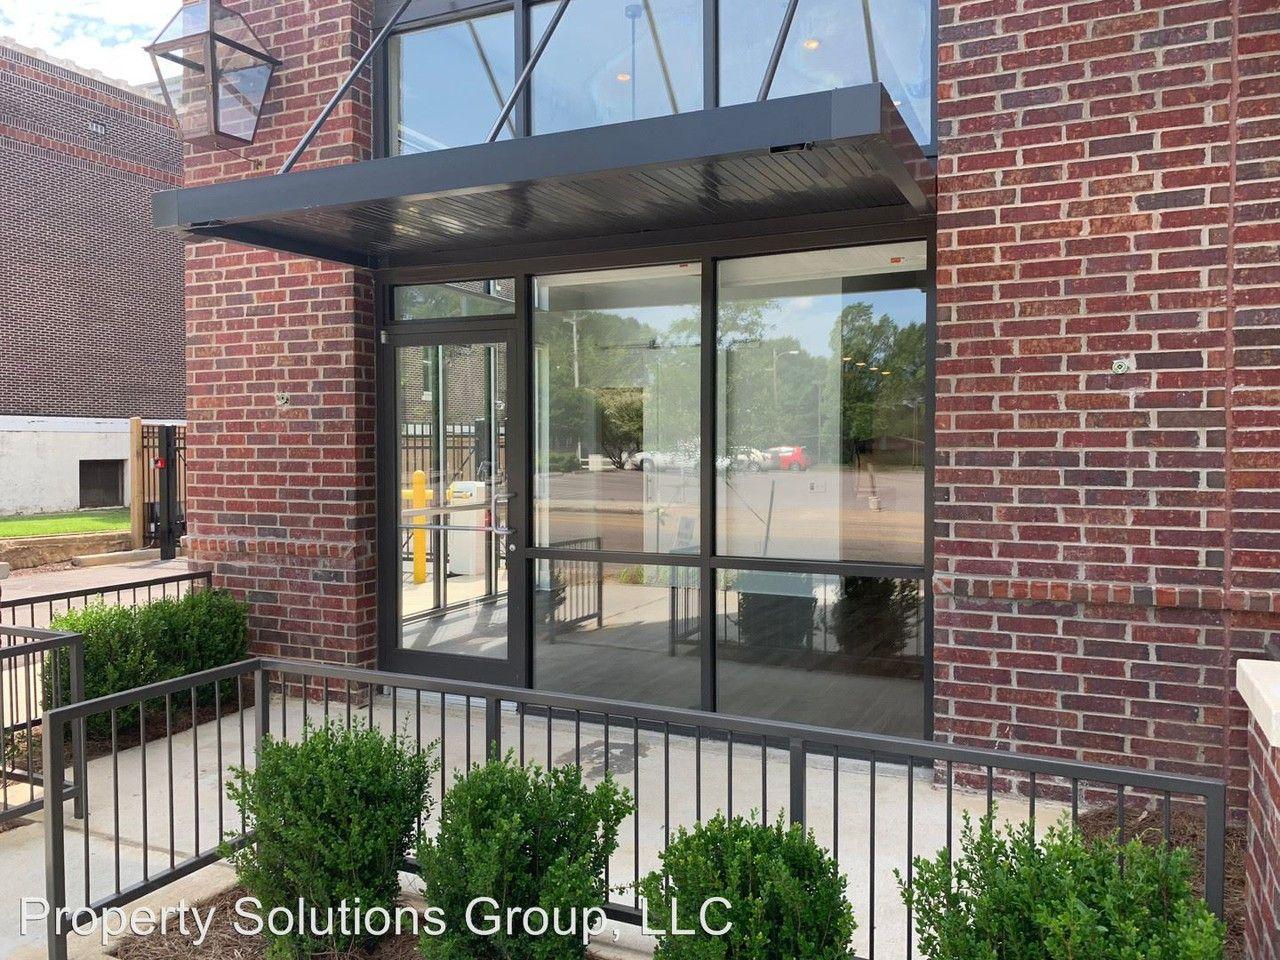 999 South Cooper St Apartments For Rent 999 Cooper St Memphis Tn 38104 Zumper